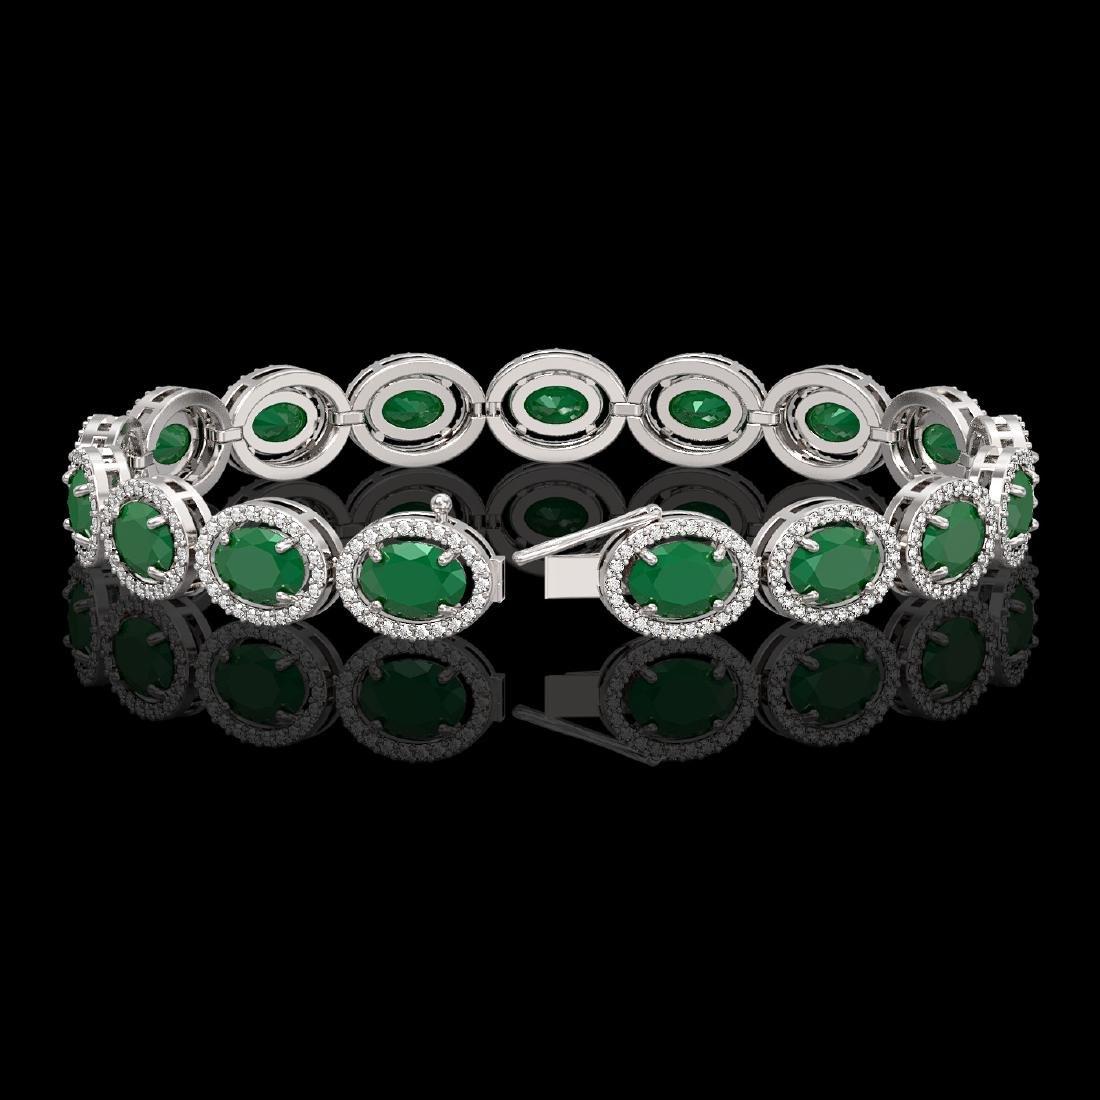 22.89 CTW Emerald & Diamond Halo Bracelet 10K White - 2